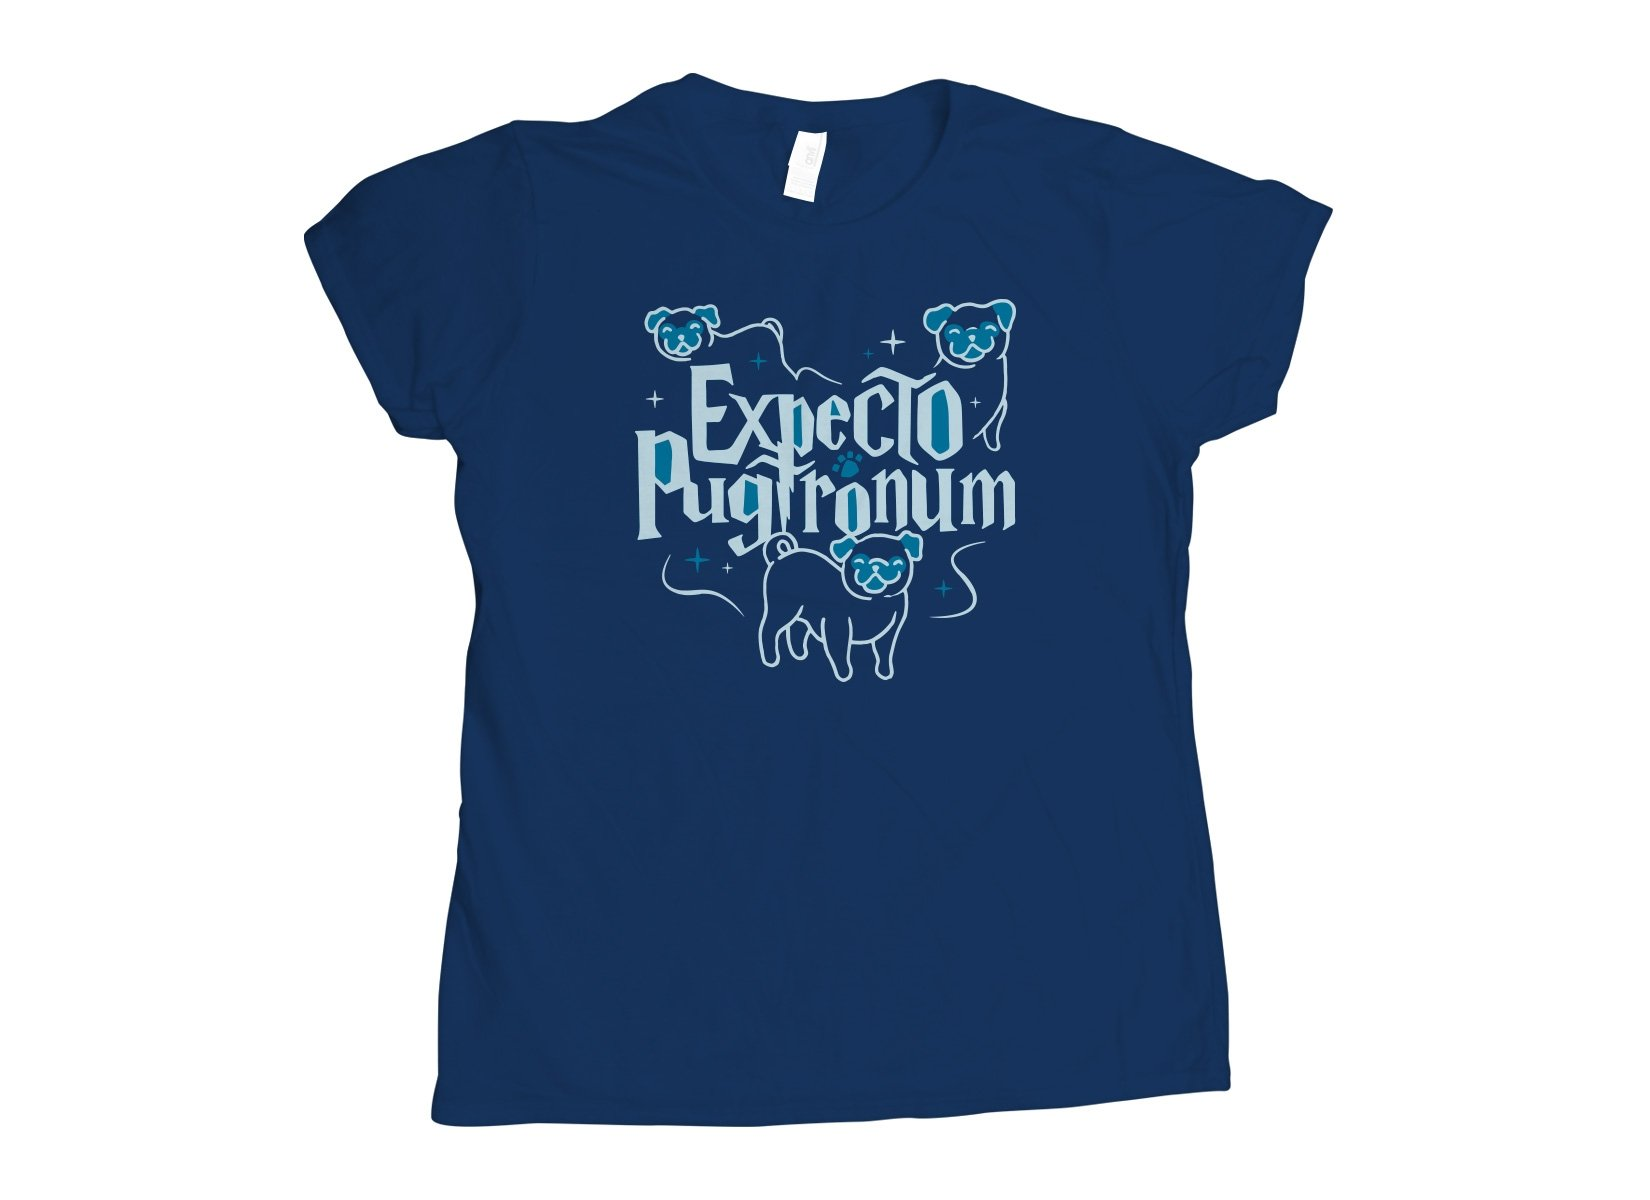 Expecto Pugtronum on Womens T-Shirt